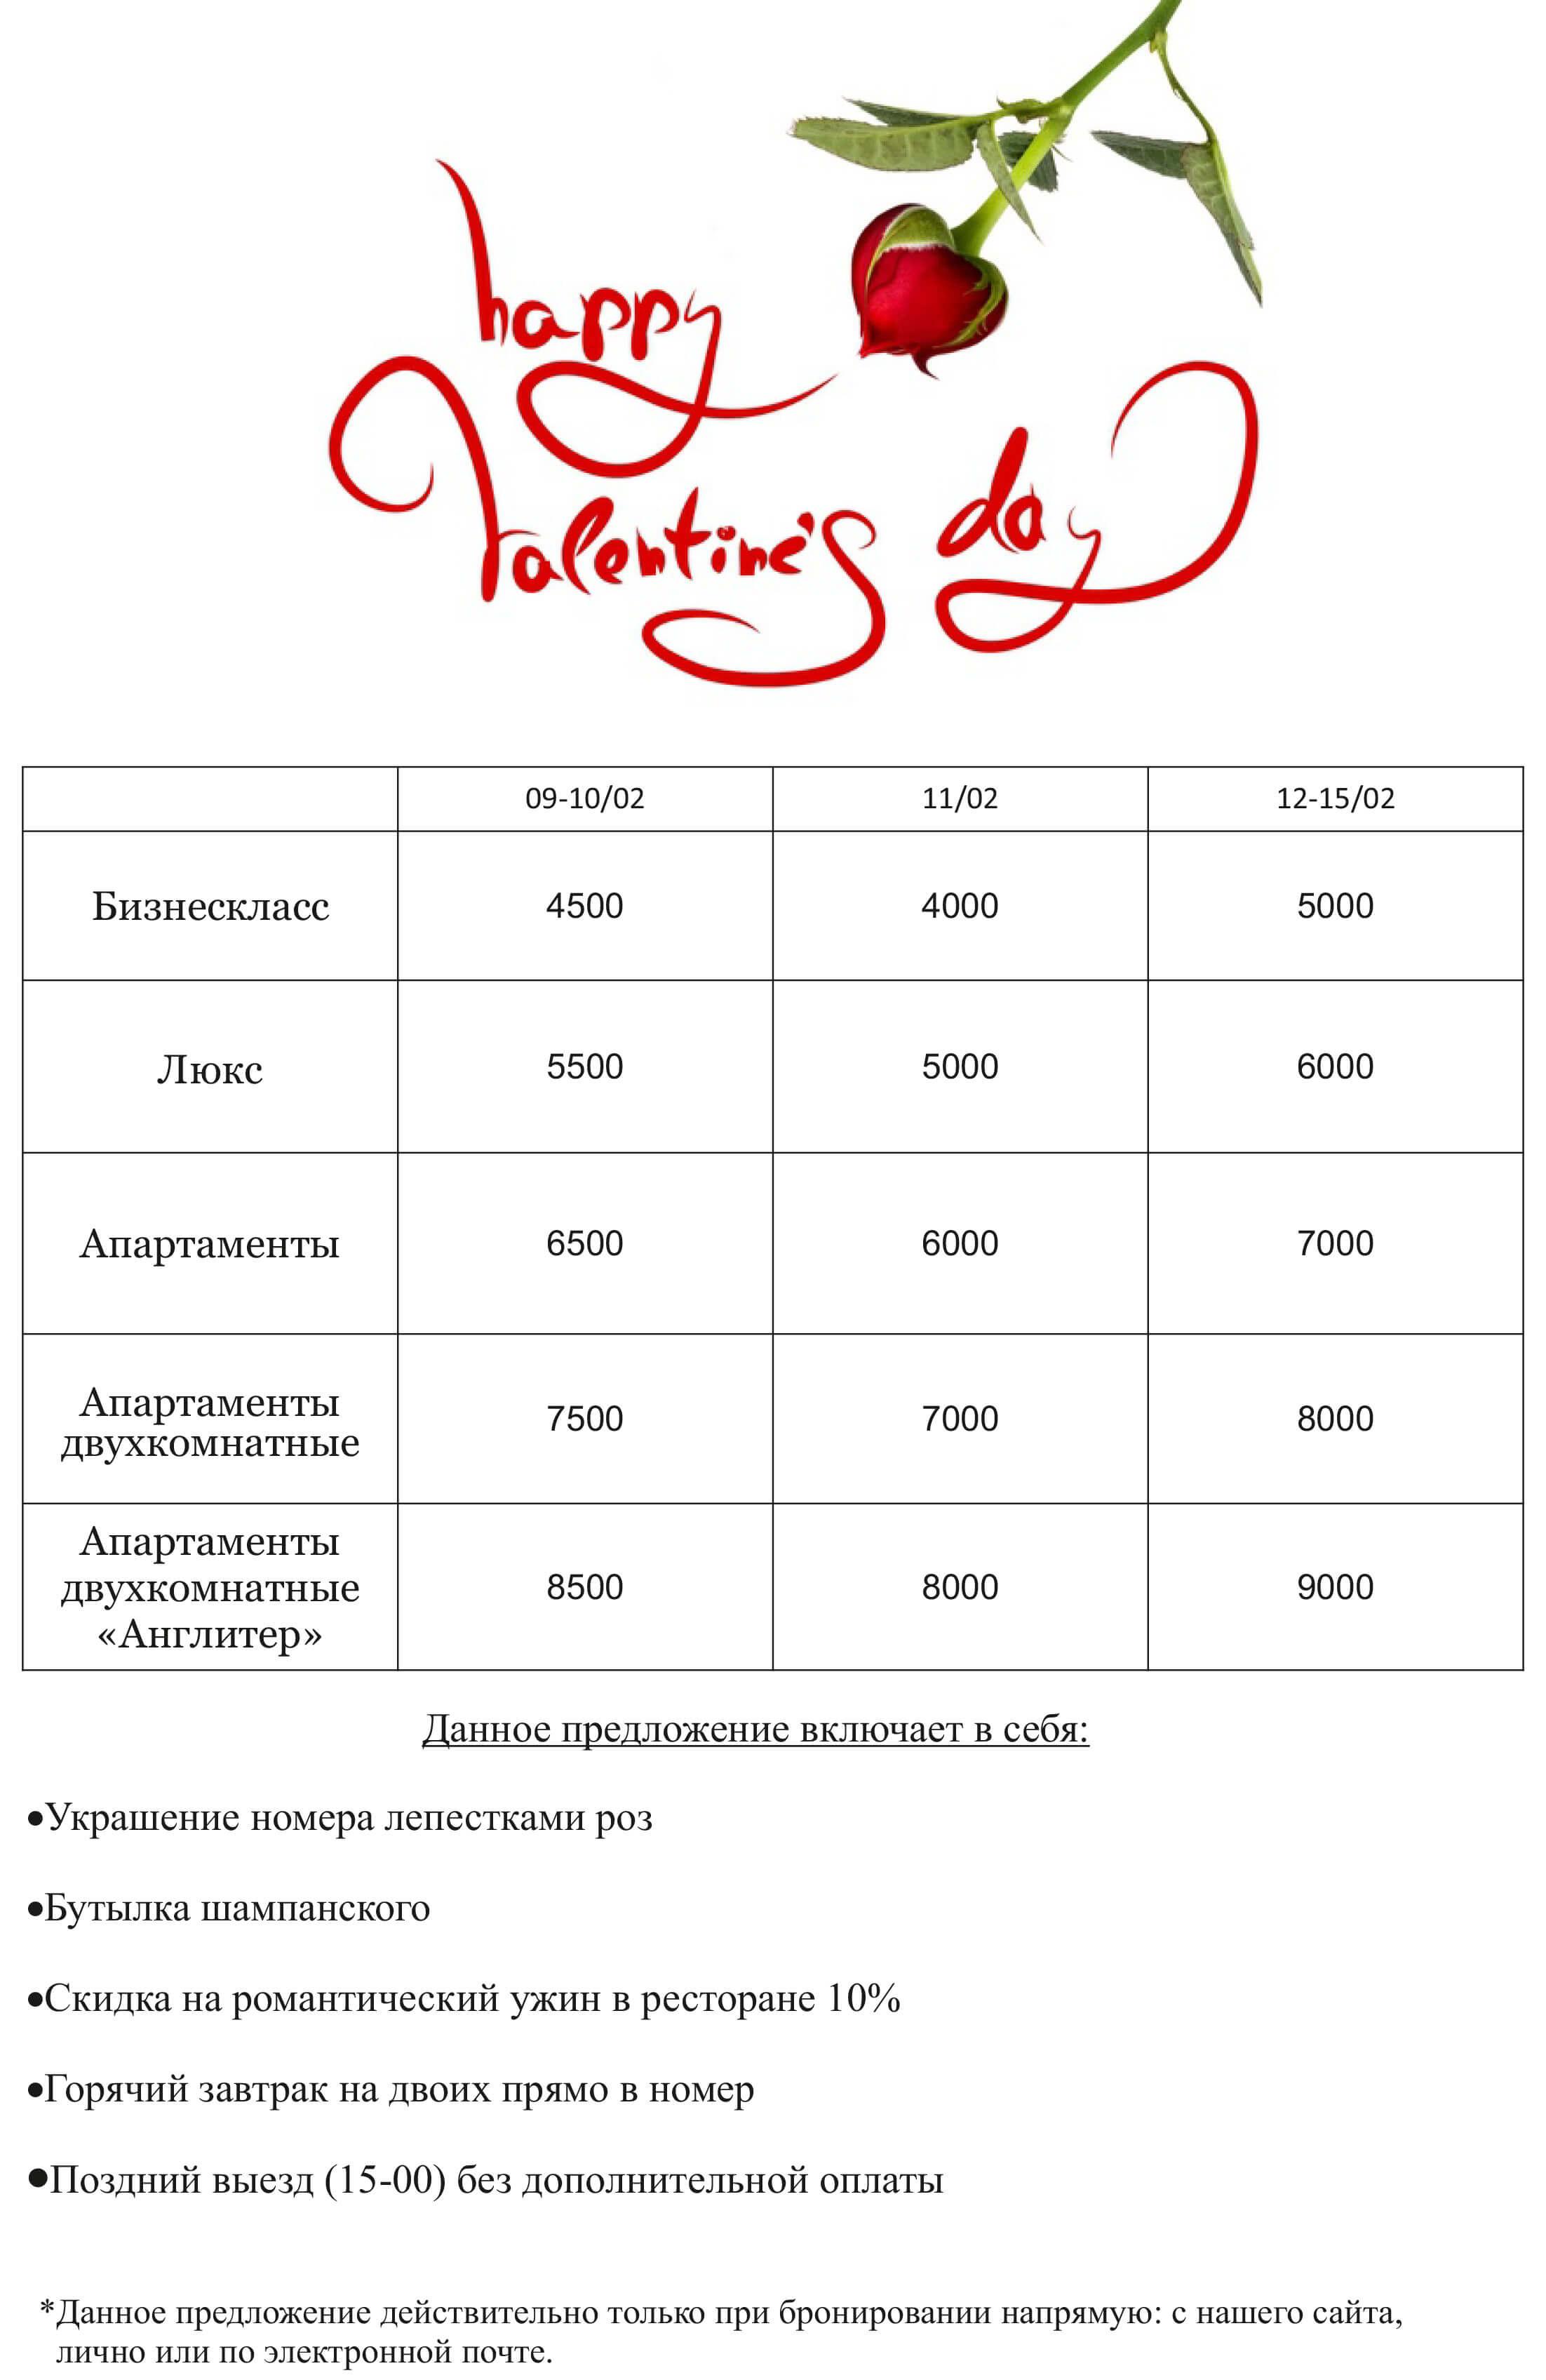 День святого валентина 2018 2 (1)